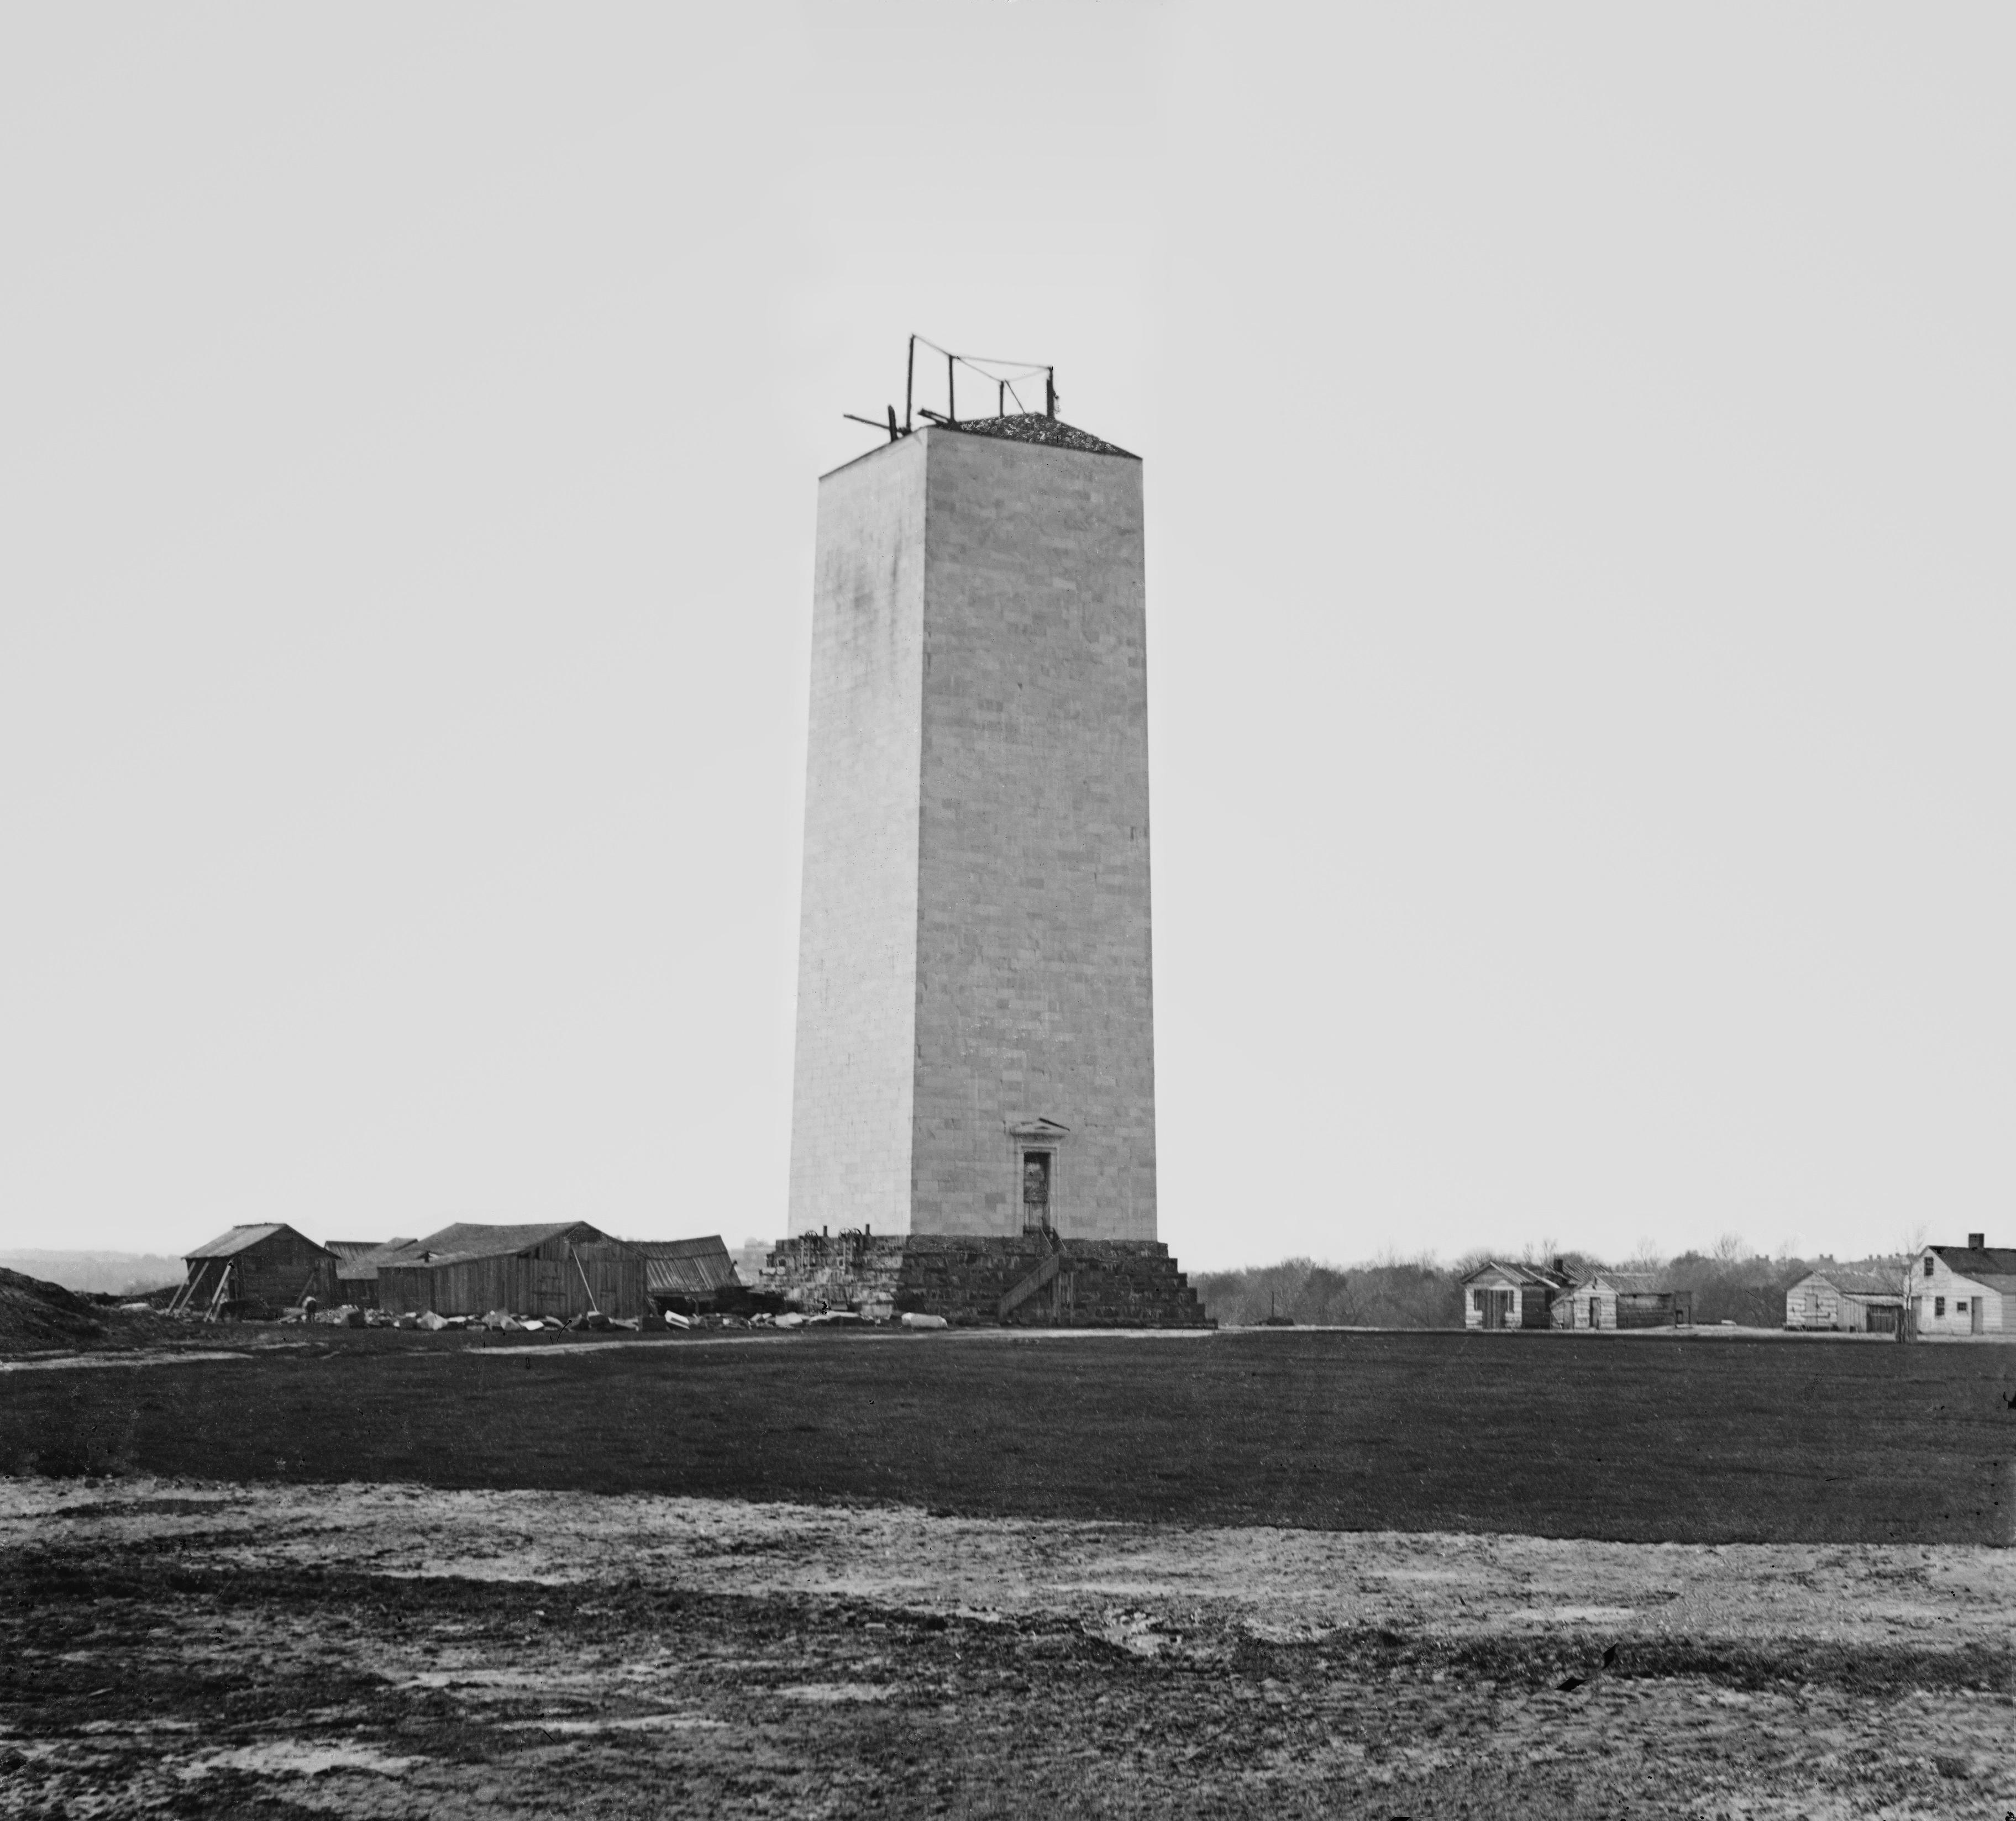 The unfinished Washington Monument photographed by Matthew Brady, circa 1860.